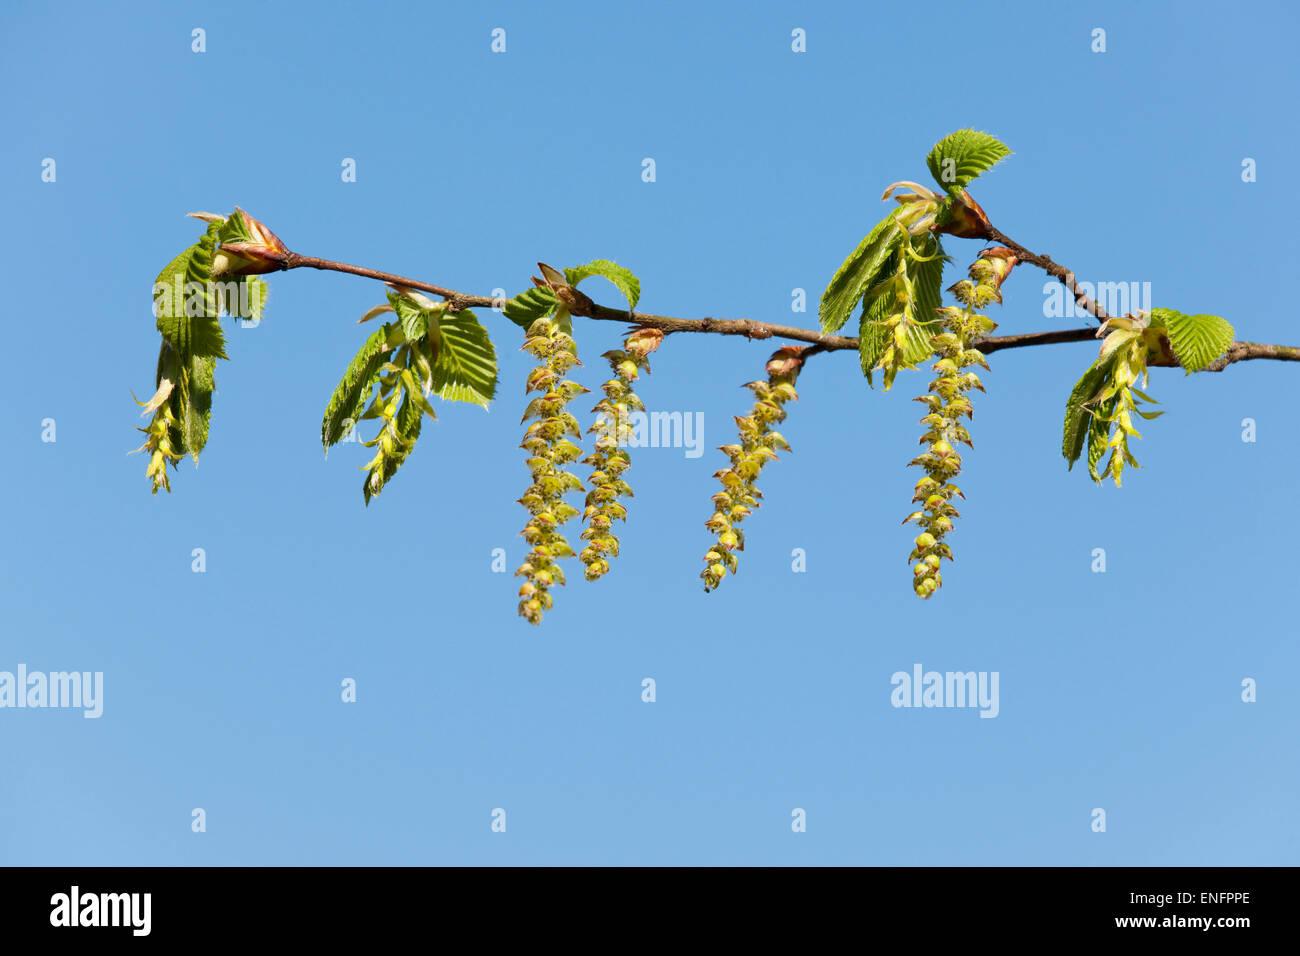 European Hornbeam (Carpinus betulus), female flowers and male catkins, Lower Saxony, Germany - Stock Image